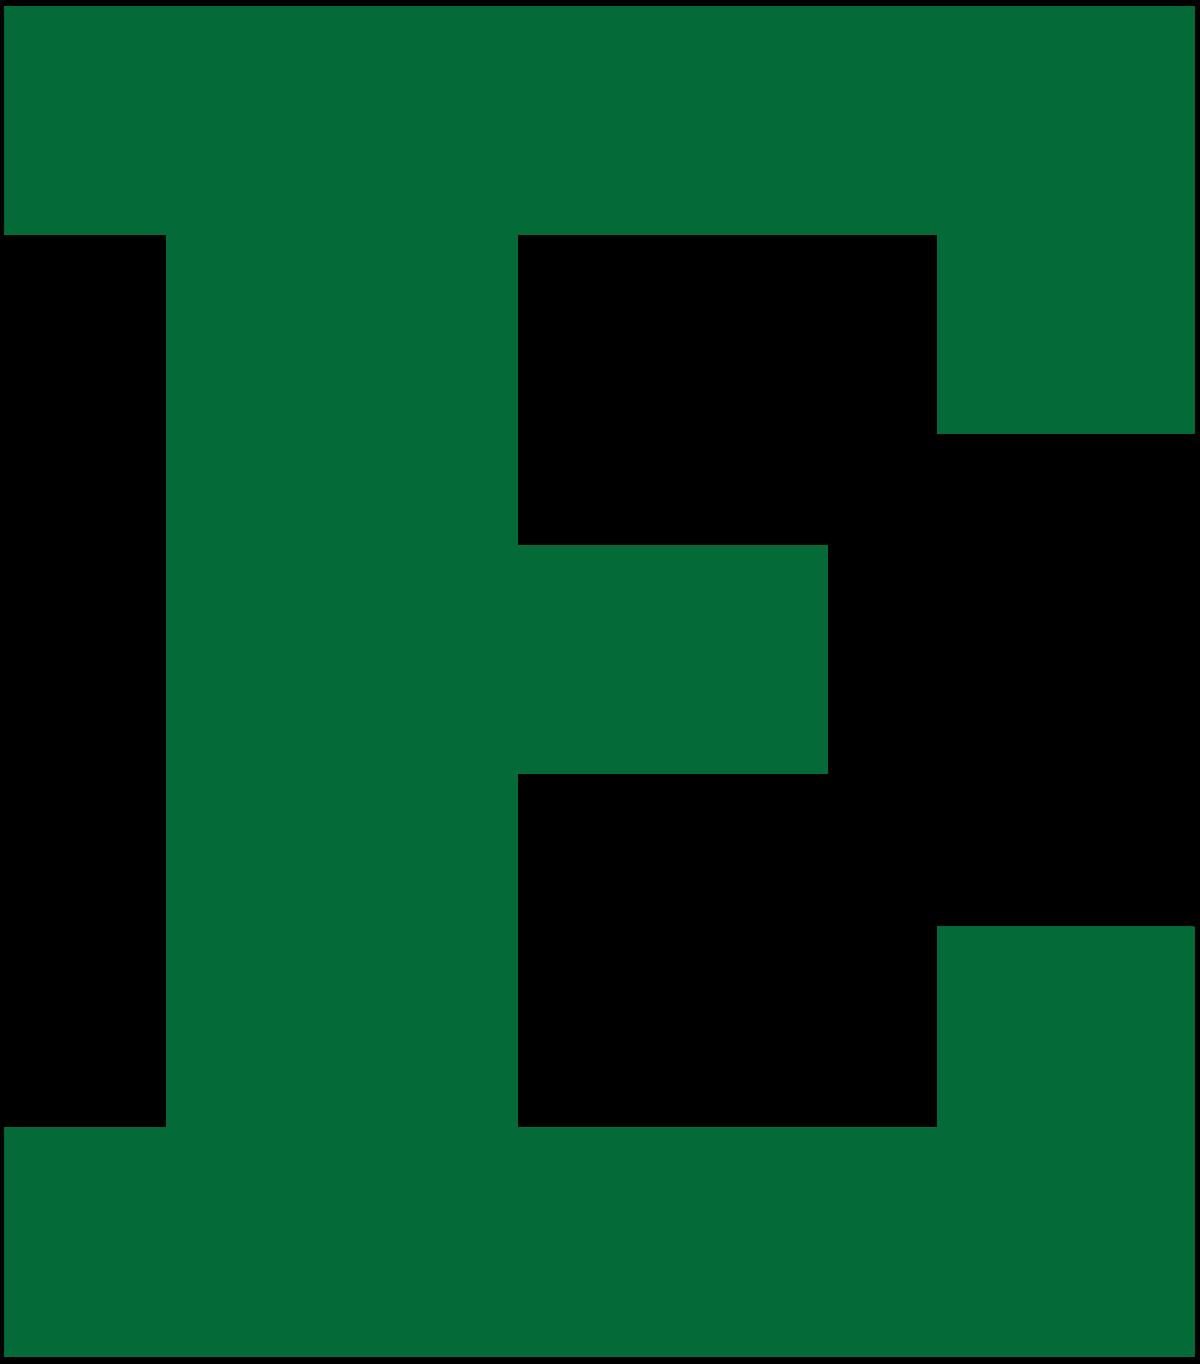 2019 Eastern Michigan Eagles football team.